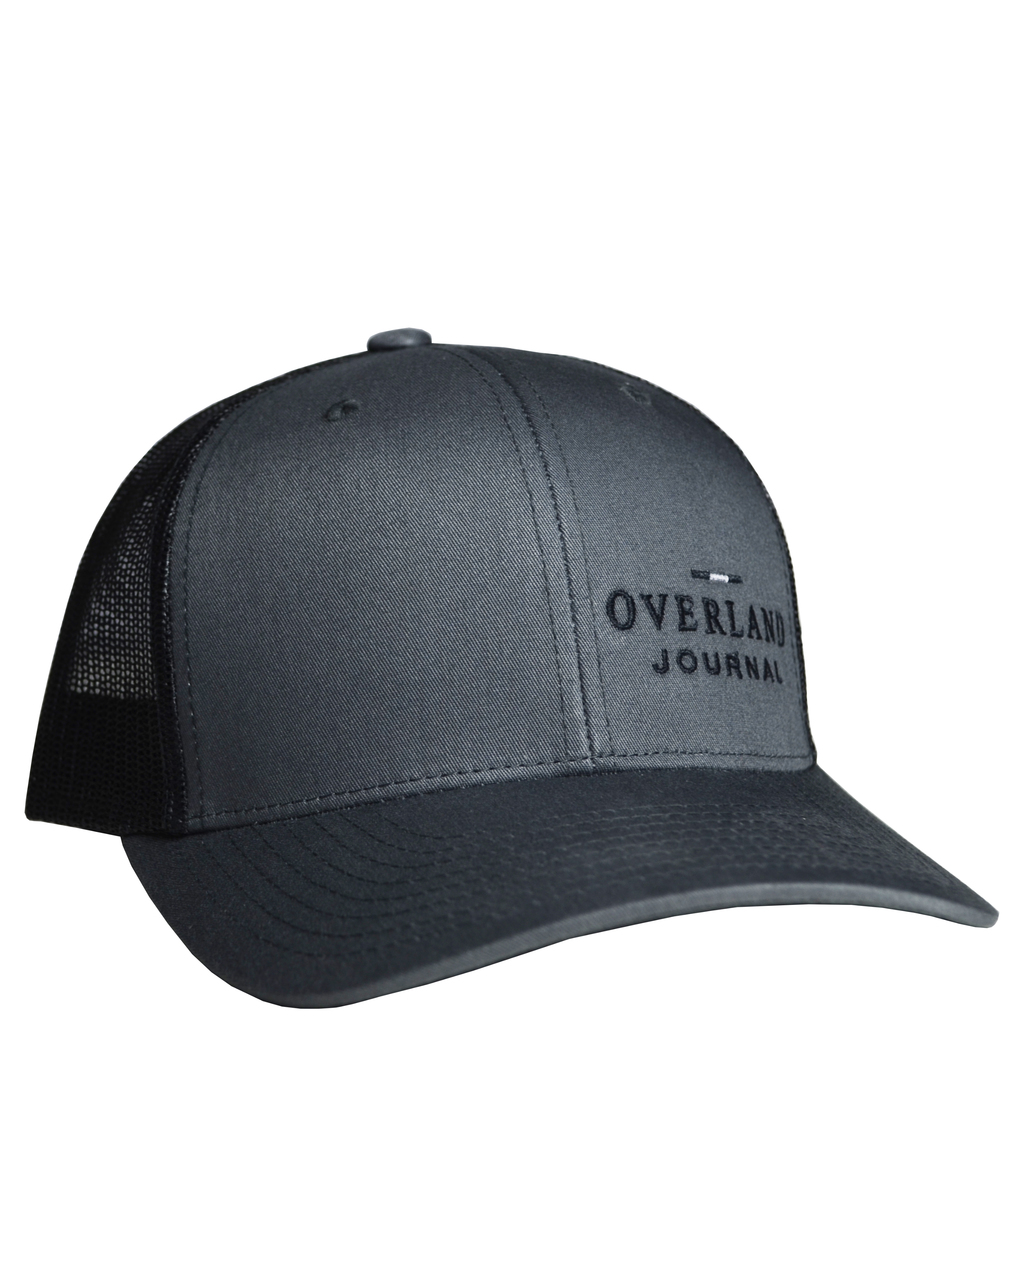 Overland Journal Black   Charcoal Hat - Overland Journal fcf1a6a7de3